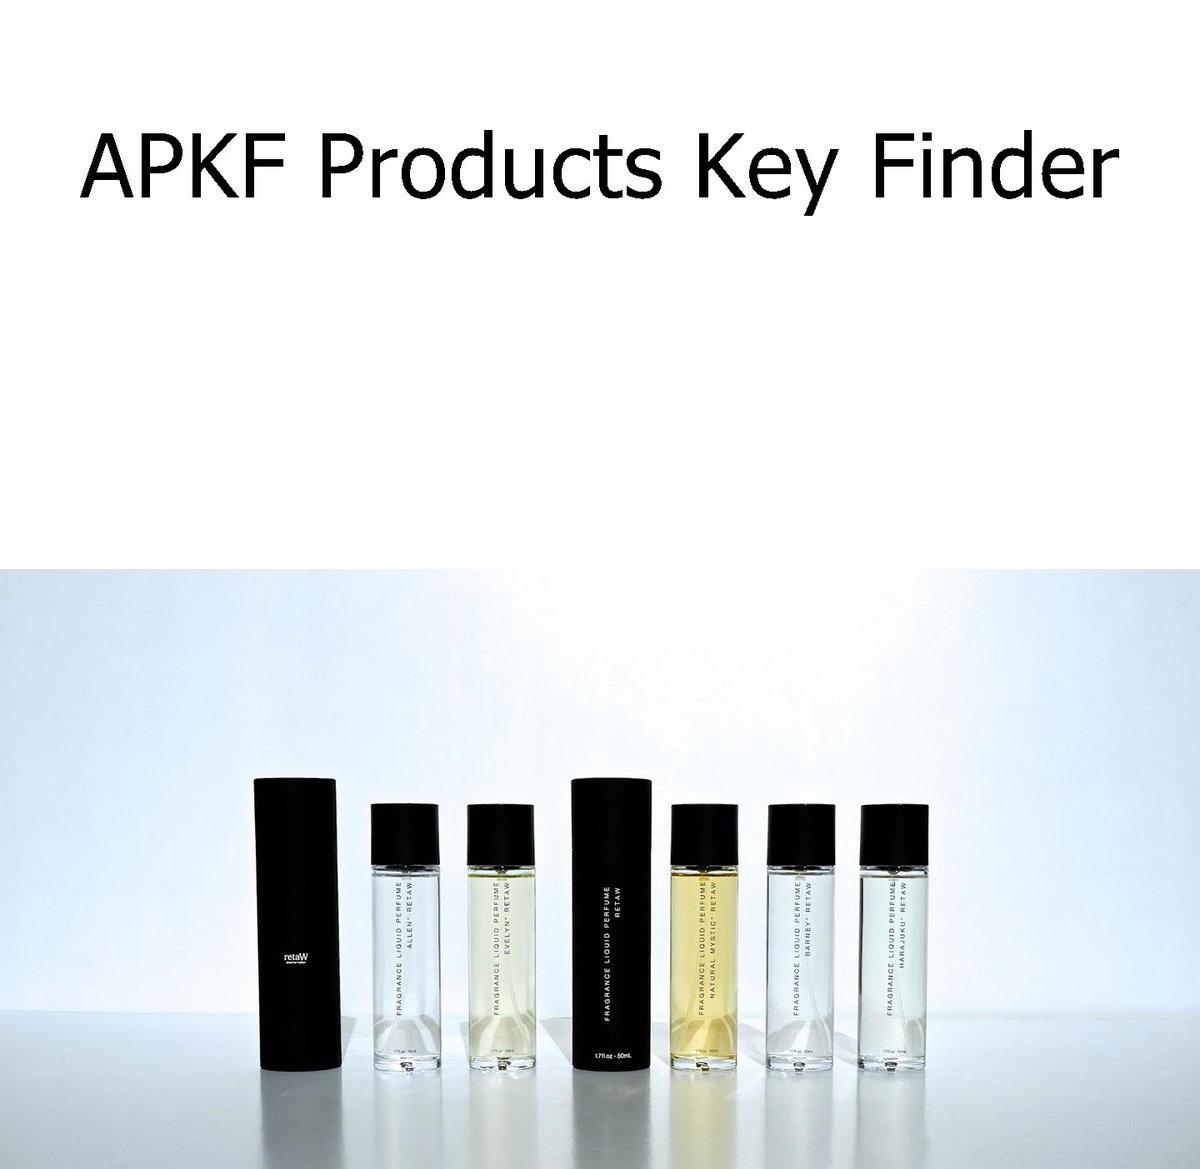 on Mac mini vers  1 1 3 APKF Products Key Finder where